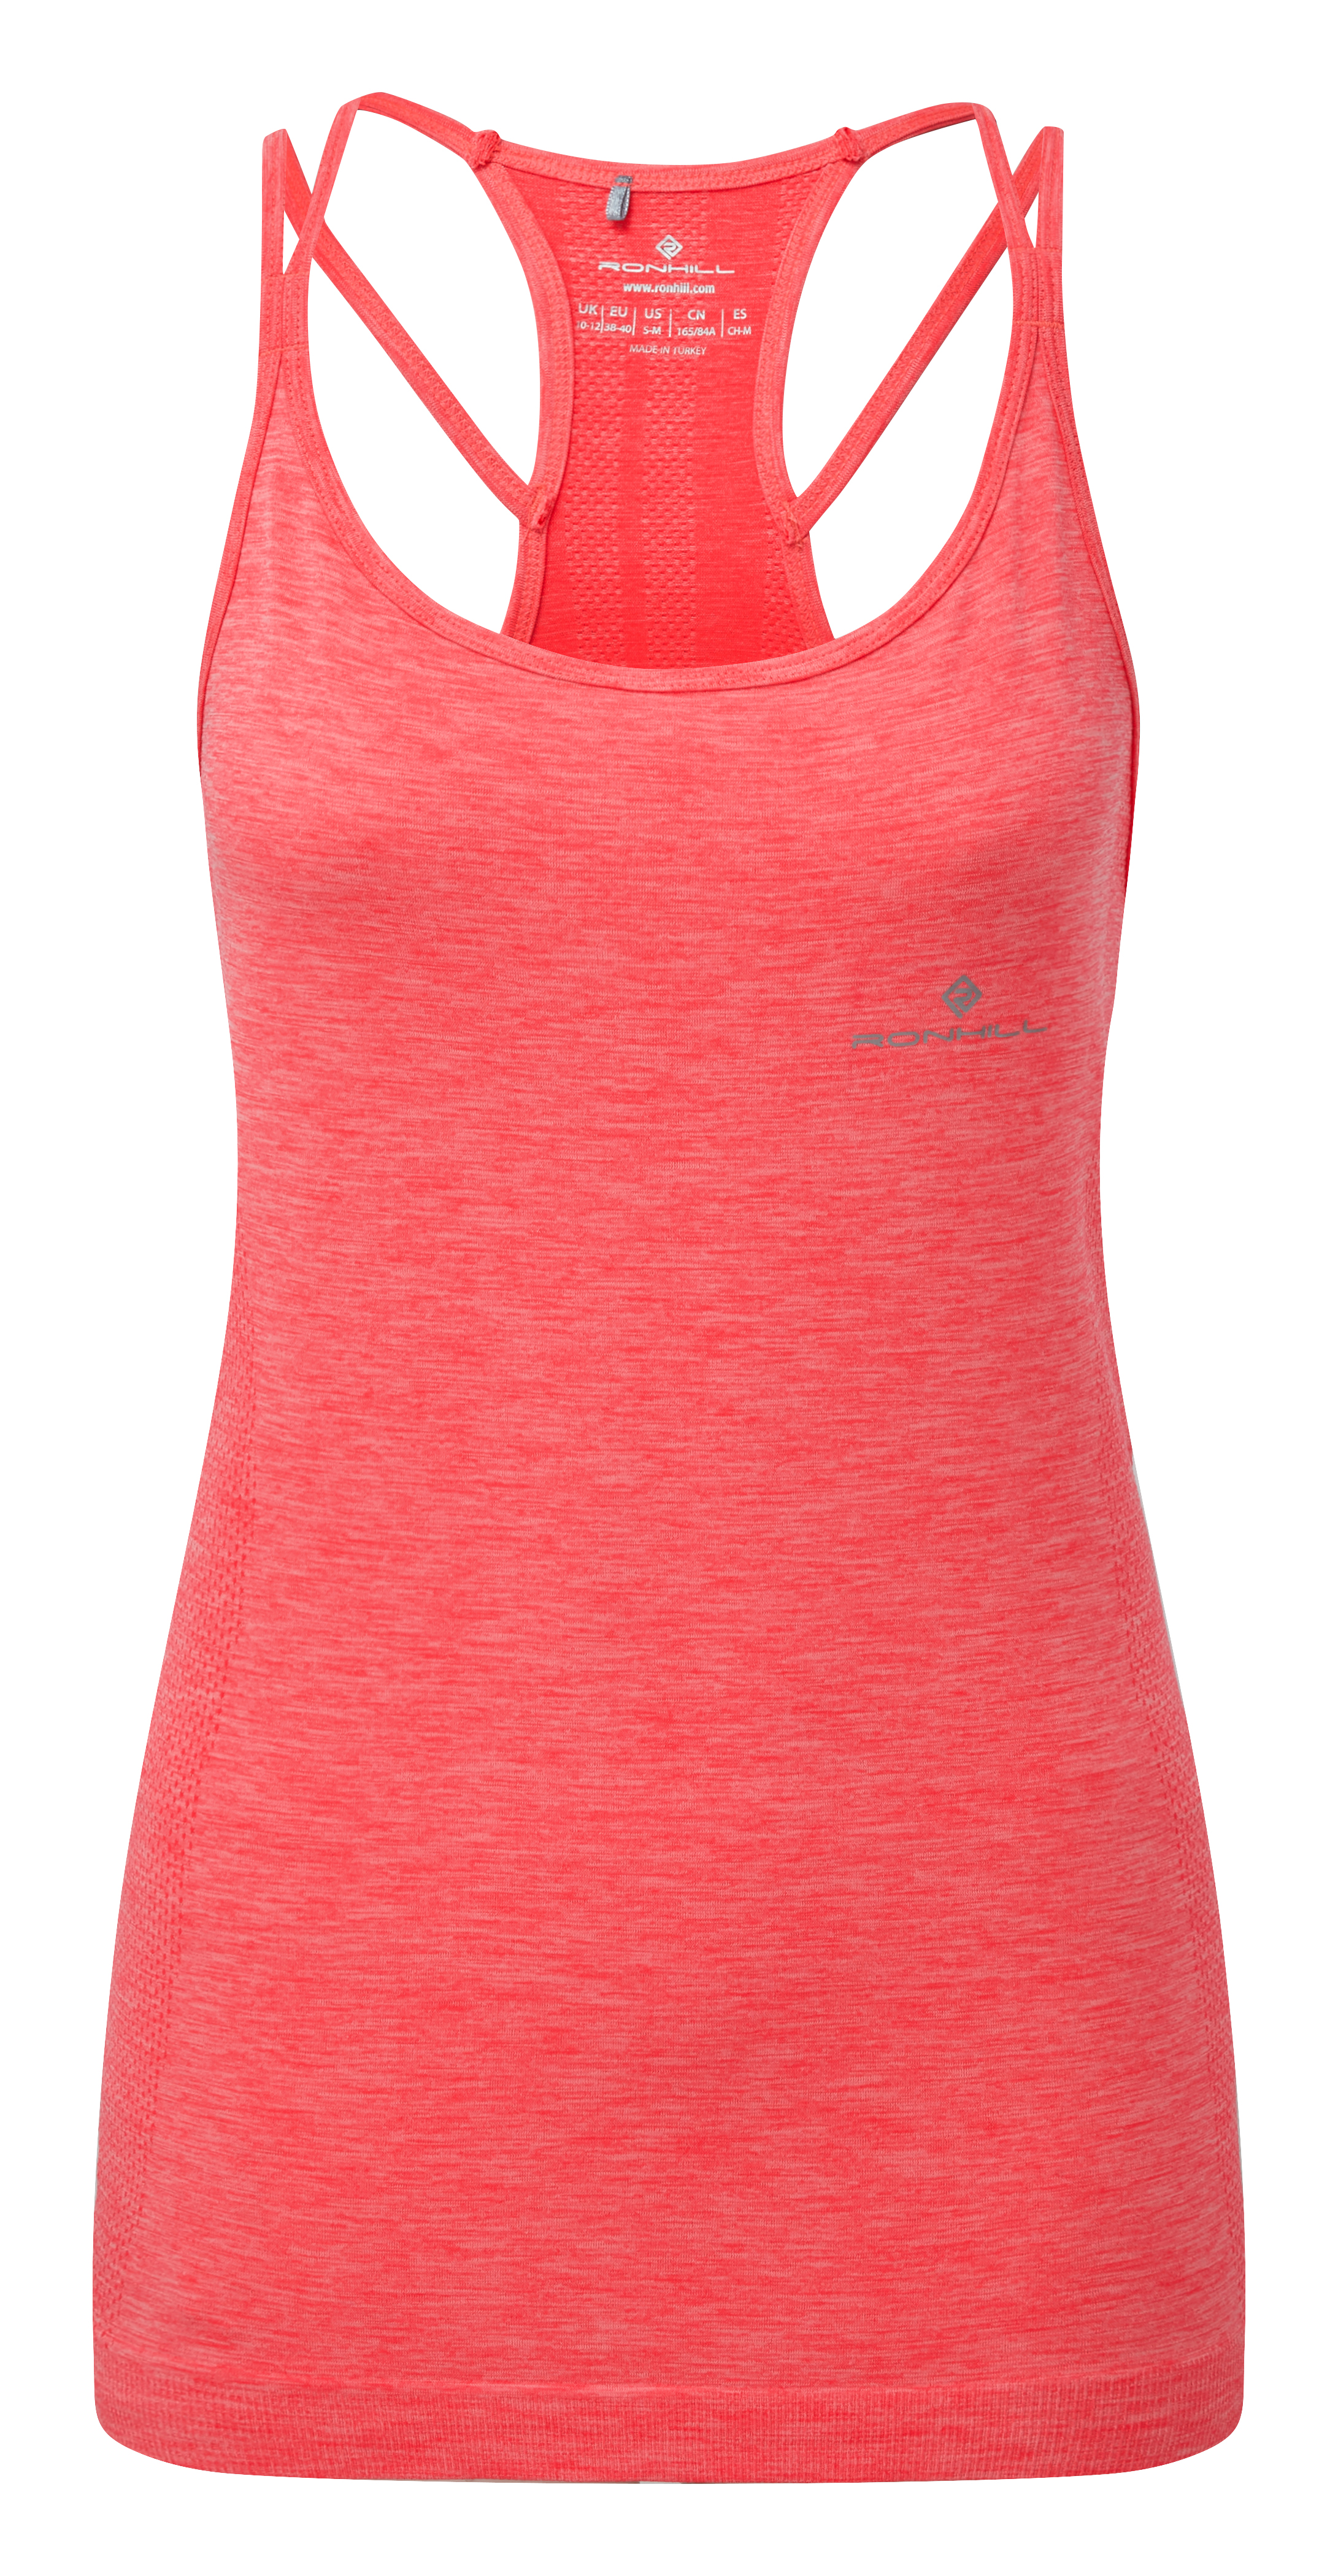 58329edf426 Ronhill Women's Infinity Marathon Tank Hot Pink Marl - Toppe ...